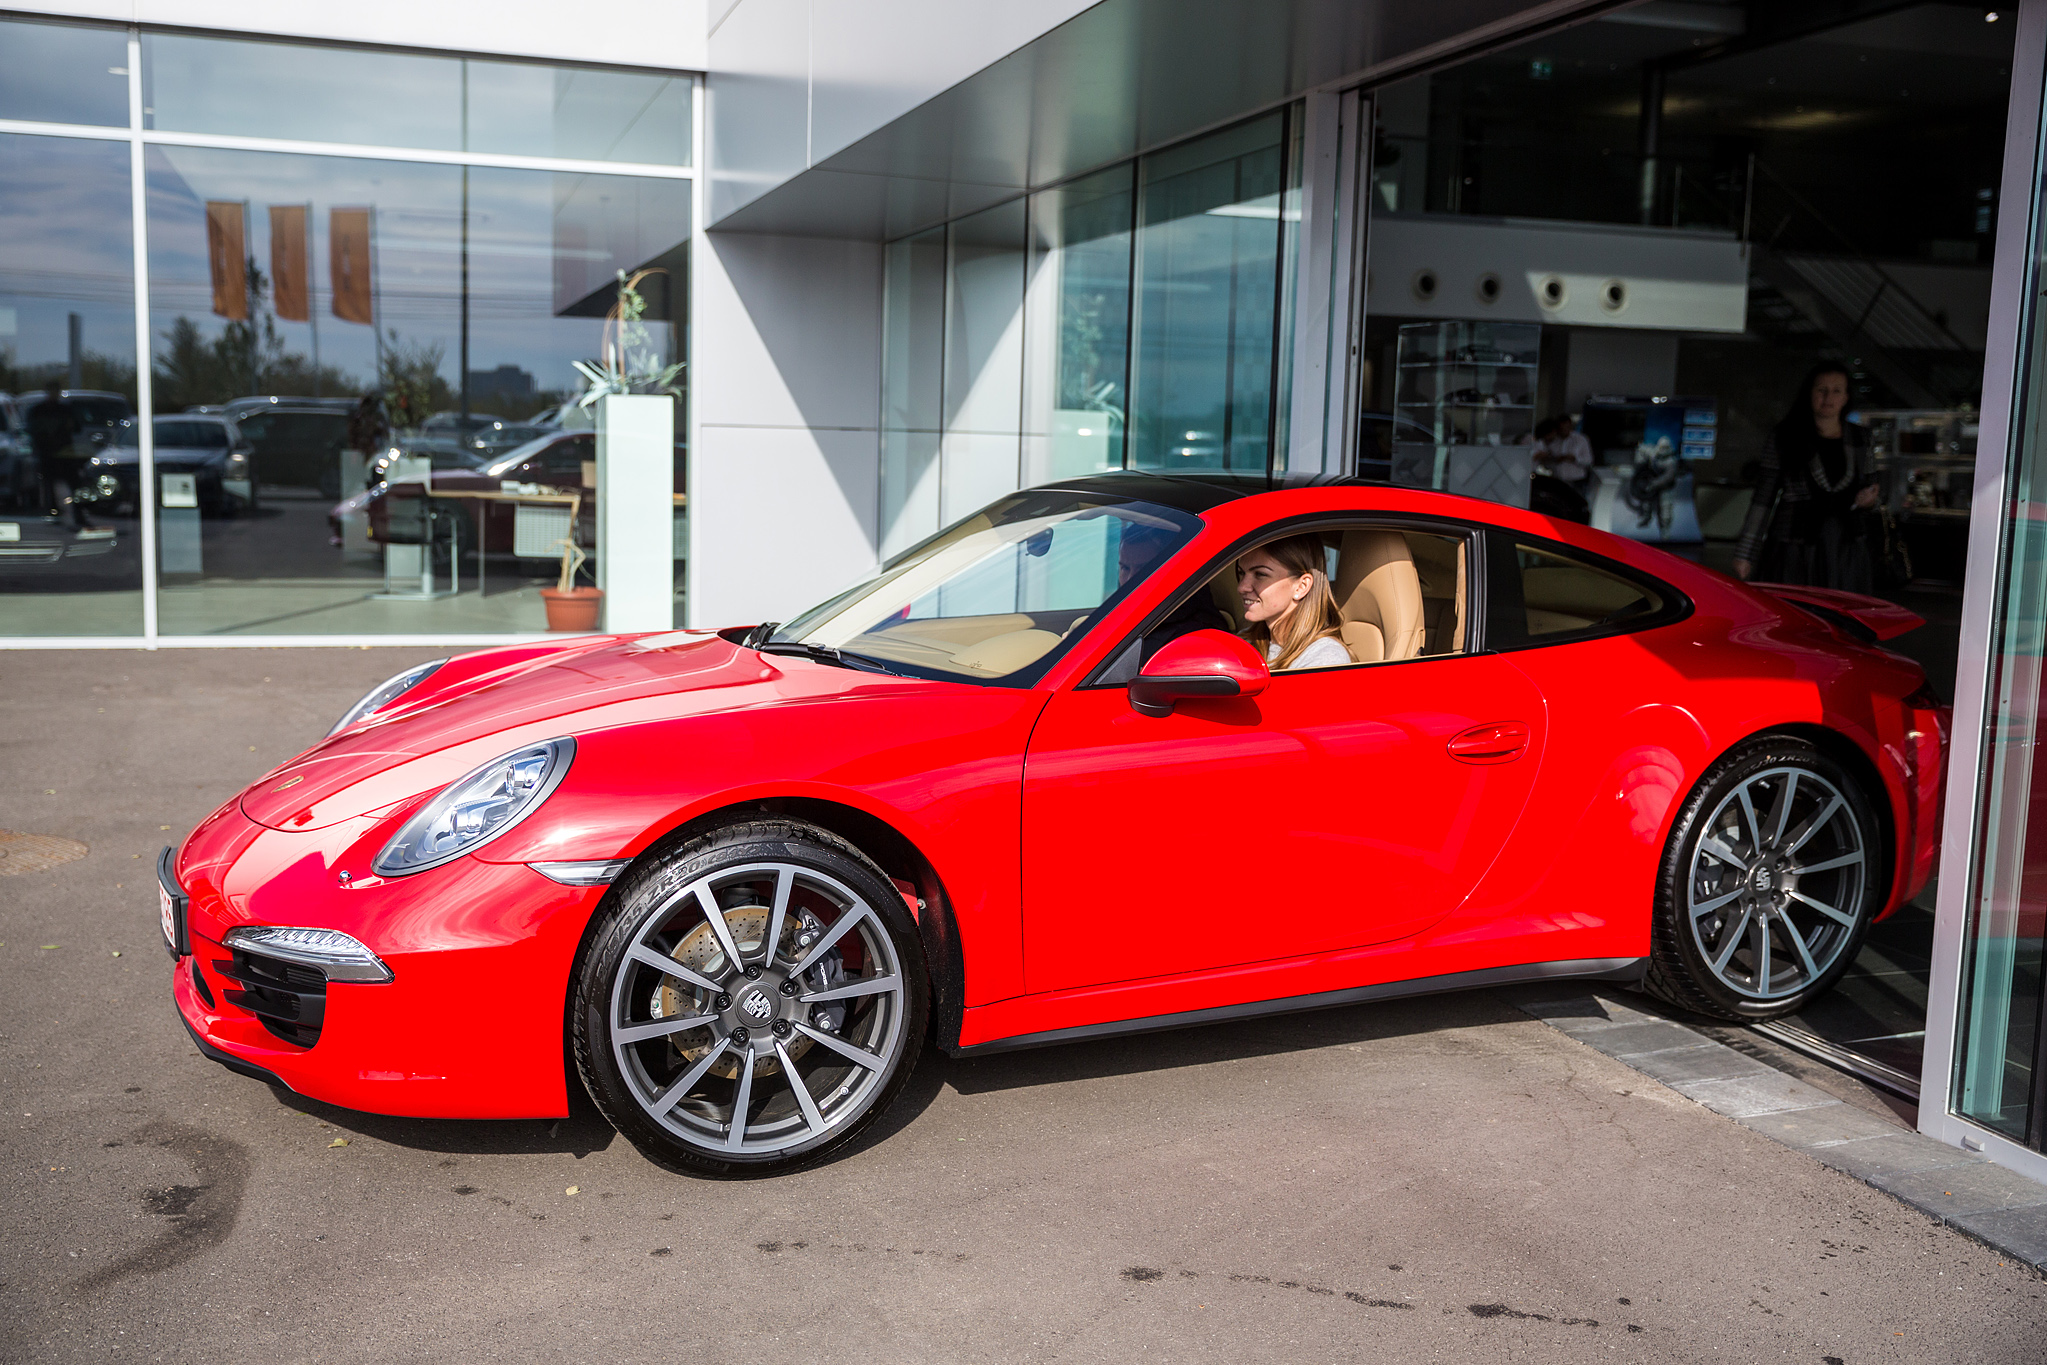 Porsche Gives Simona Halep A Red 911 Carrera 4 Autoevolution